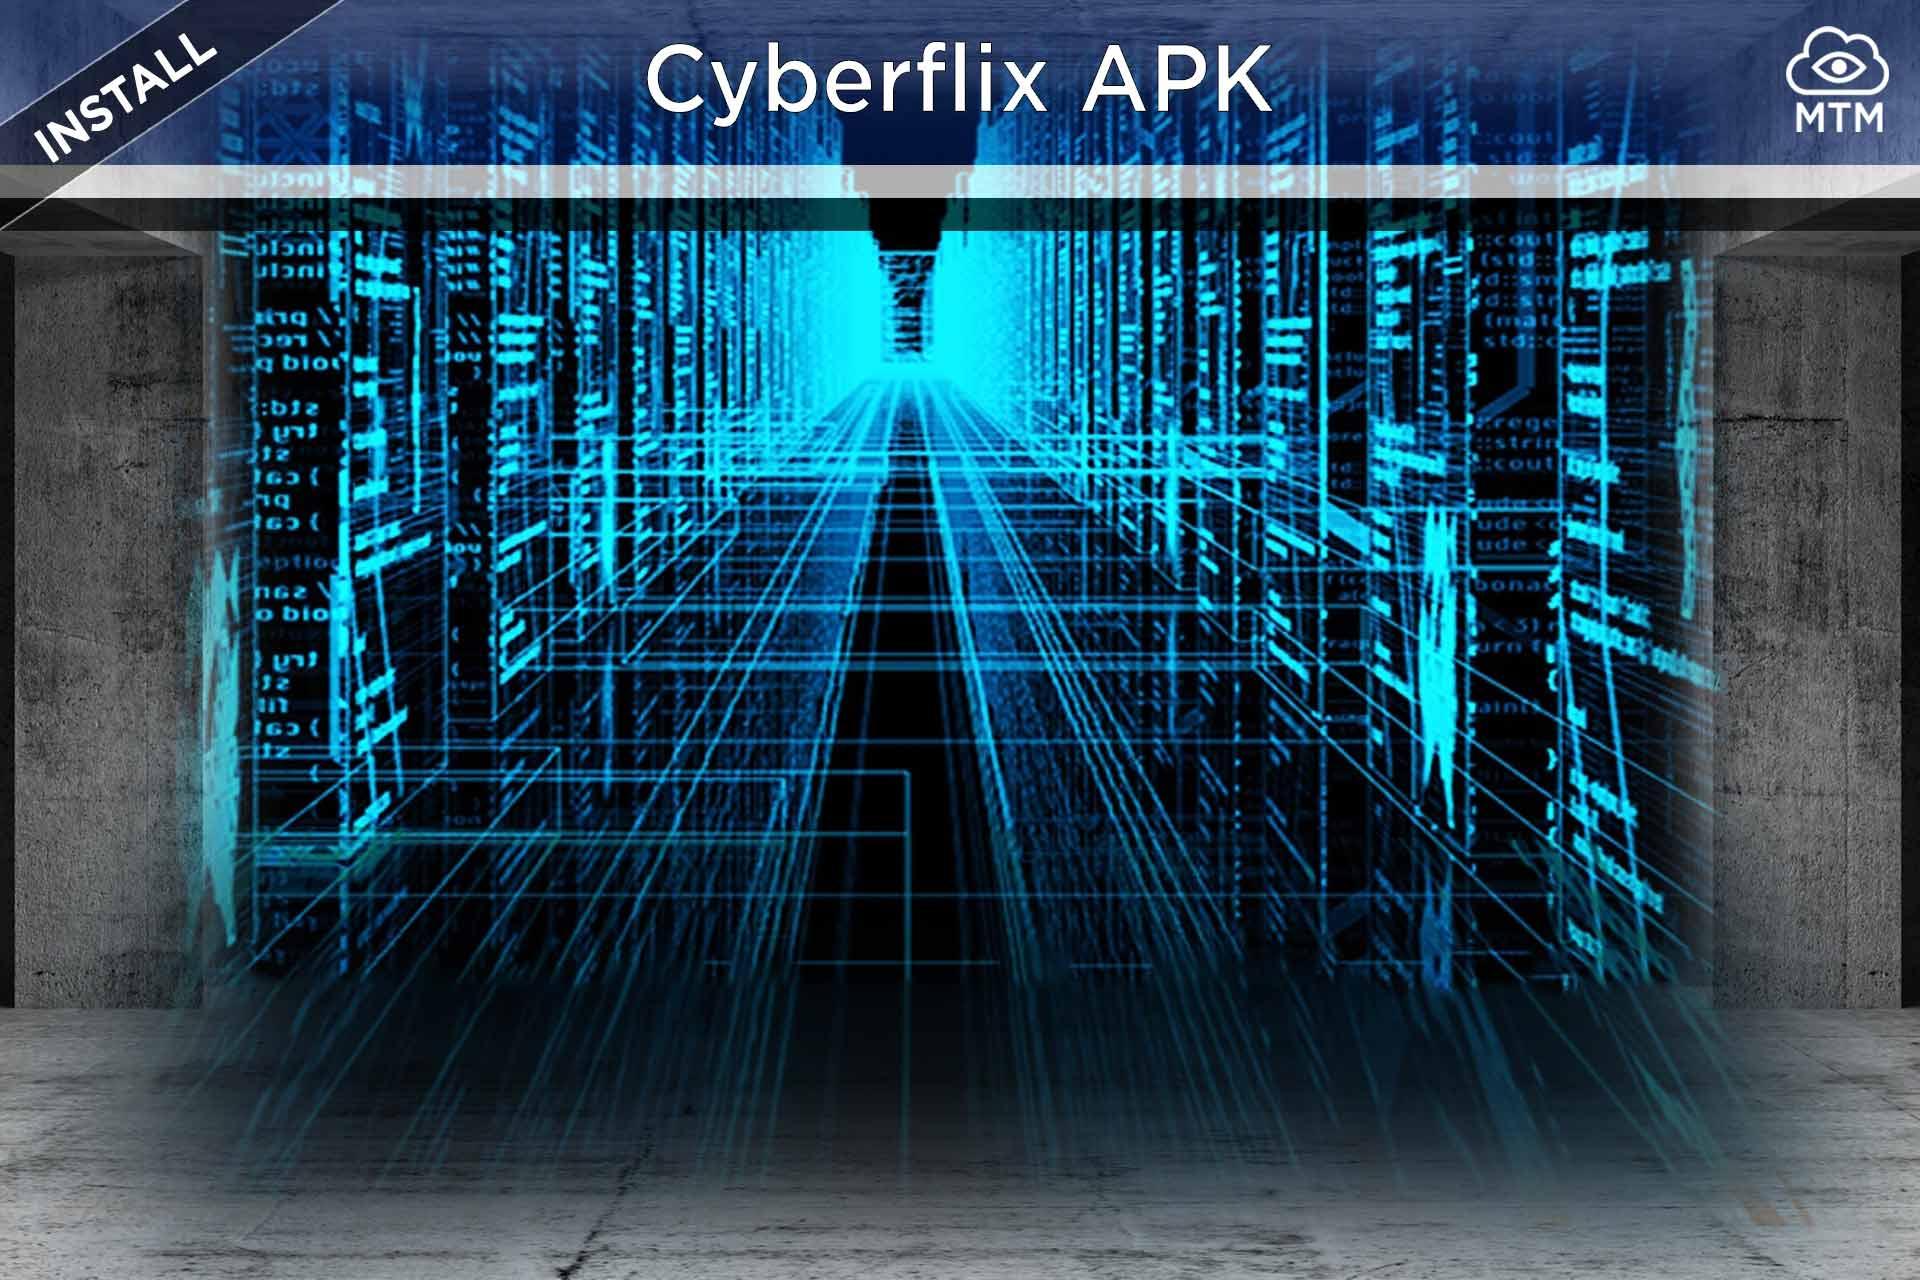 Nola instalatu Cyberflix TV APK Firestick eta Android TV Box-en